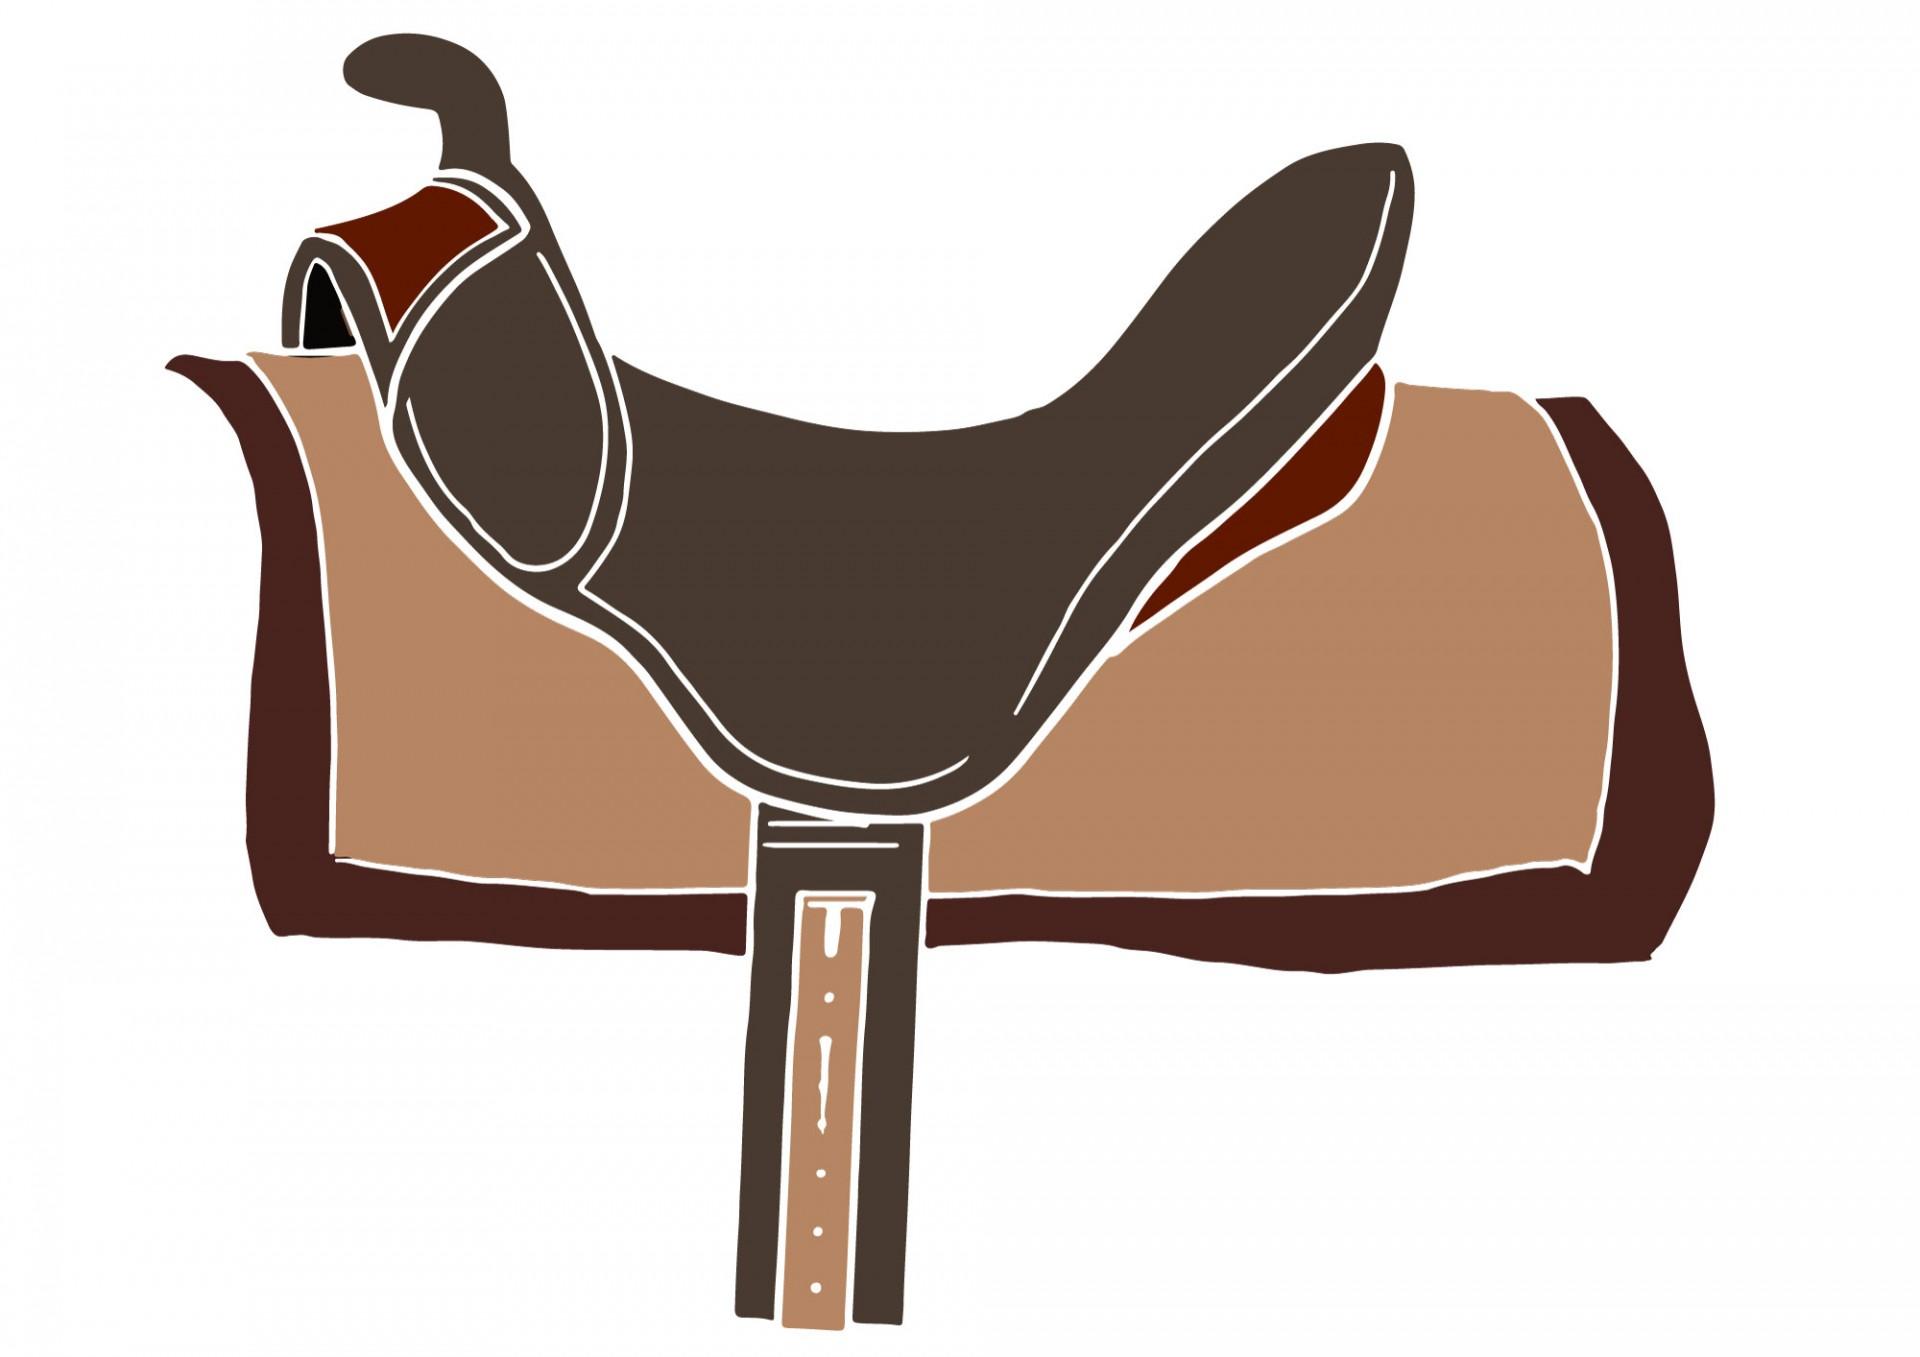 Saddle clipart #1